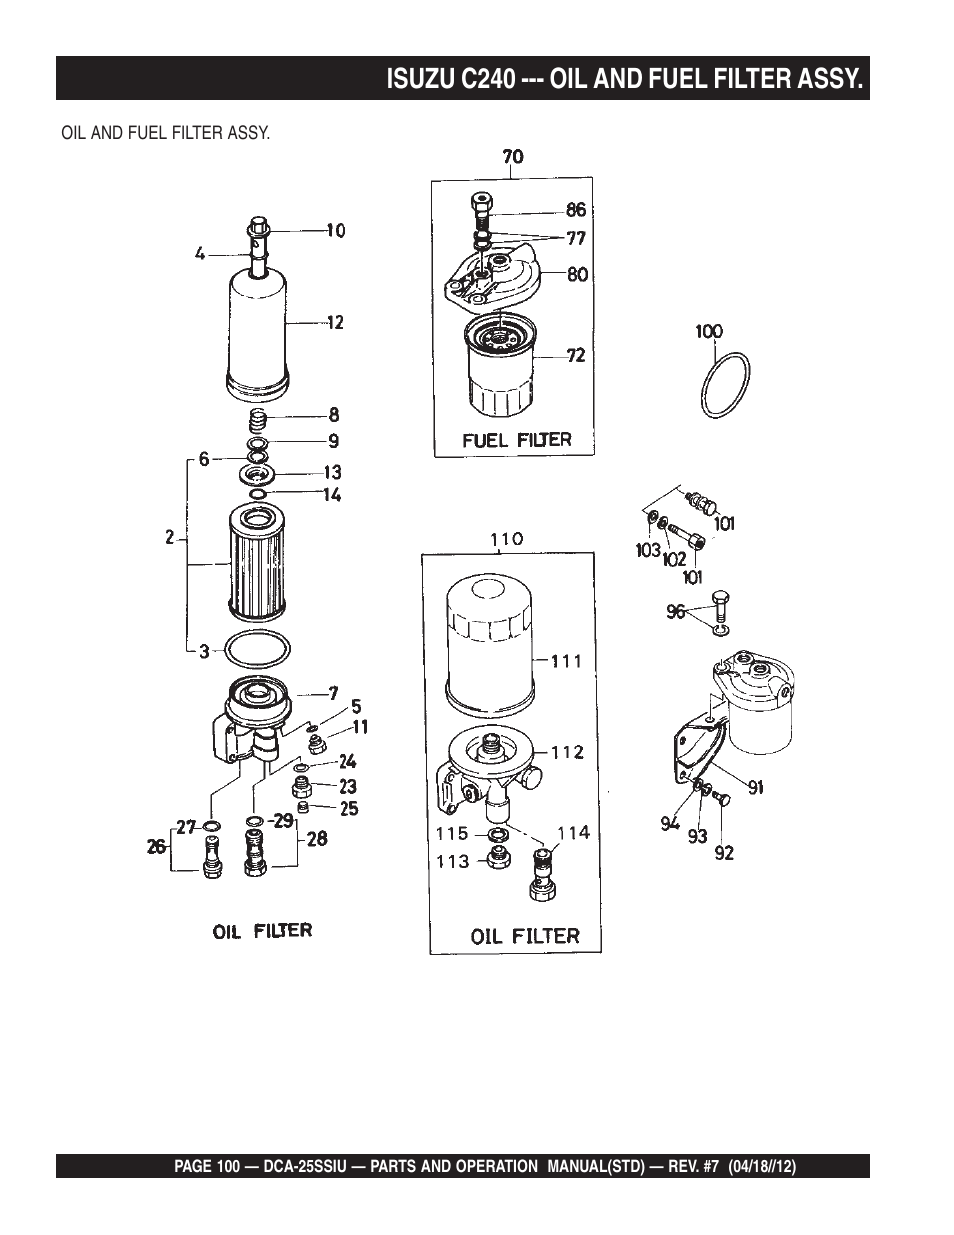 medium resolution of isuzu c240 oil and fuel filter assy multiquip wisperwatt generator dca25ssiu user manual page 100 142